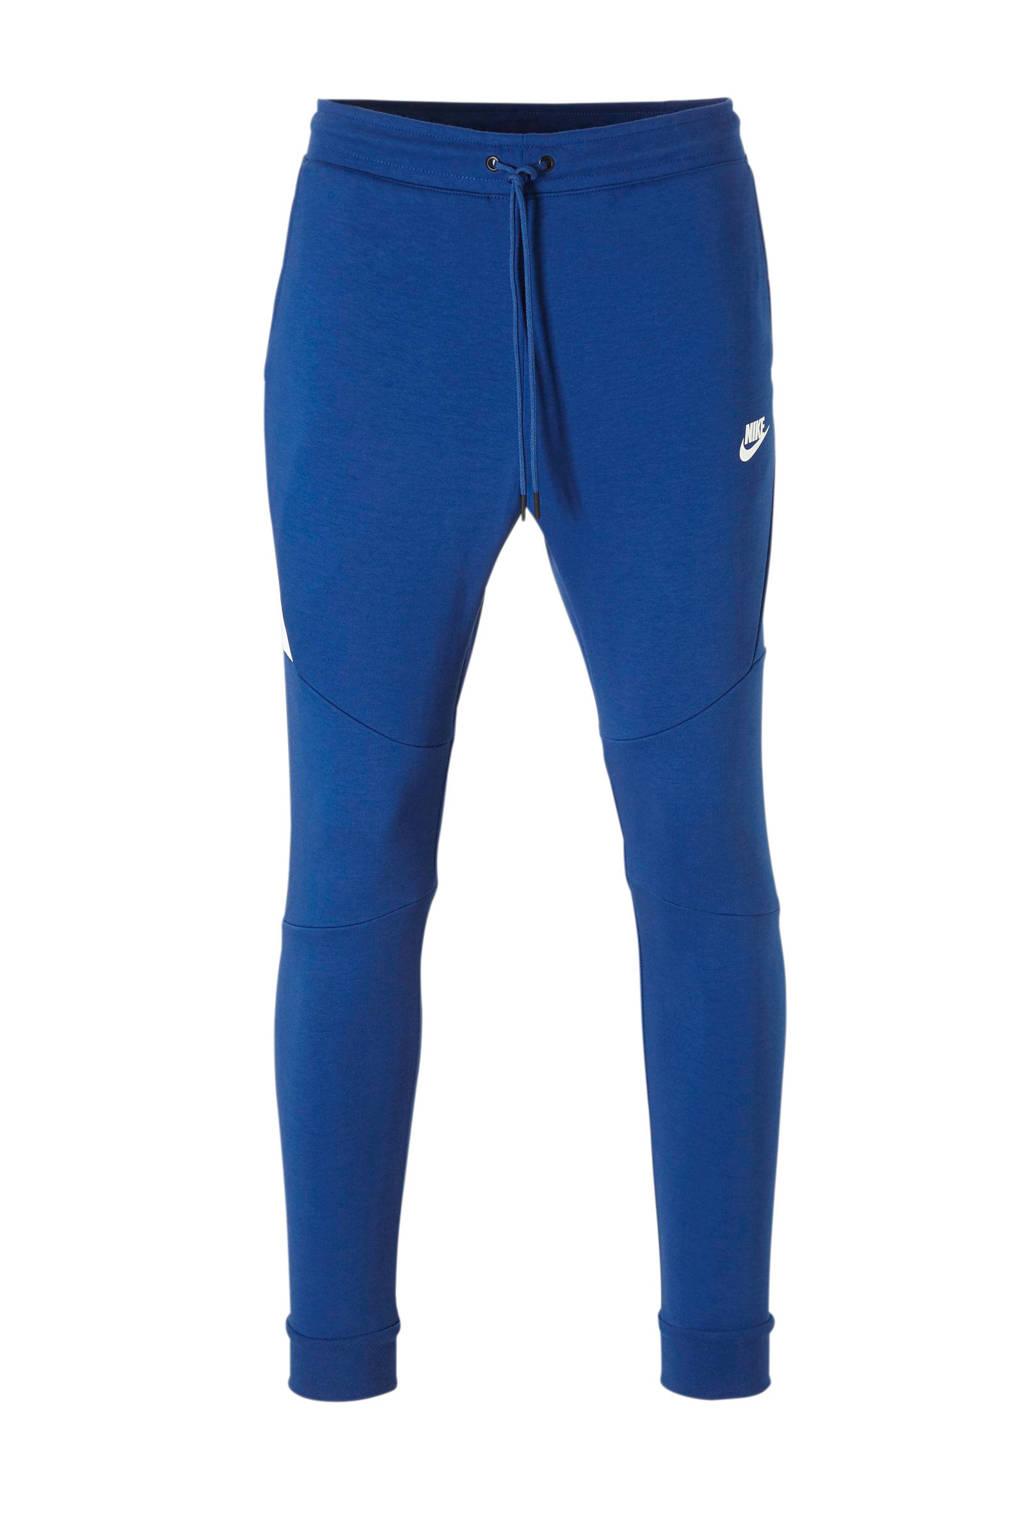 Nike sportbroek blauw, Blauw